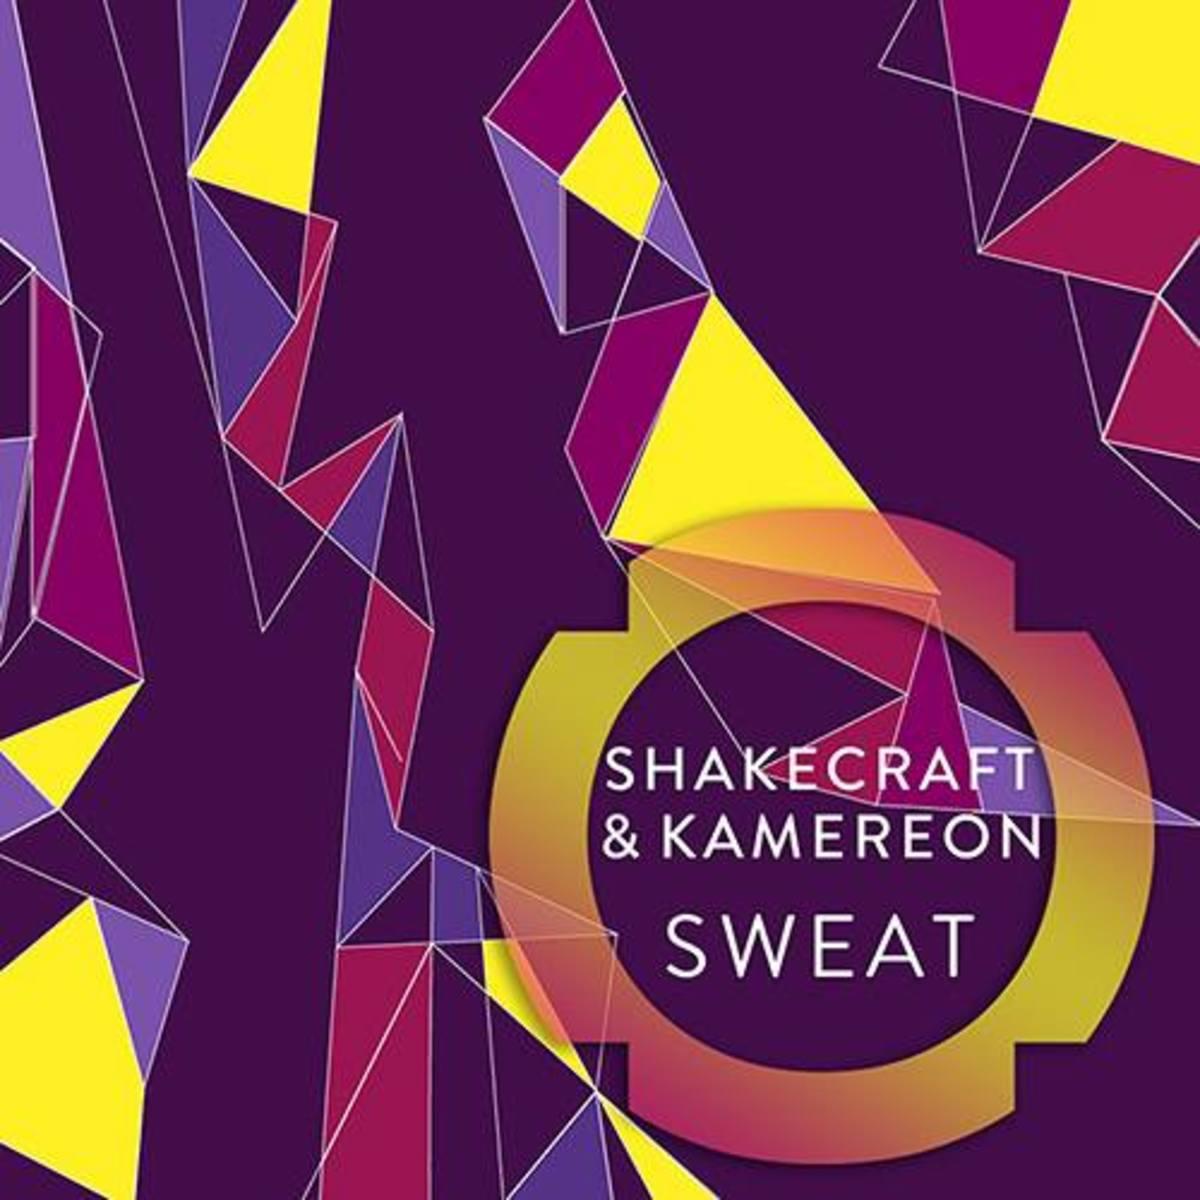 Shakecraft & Kamereon Sweat Artwork